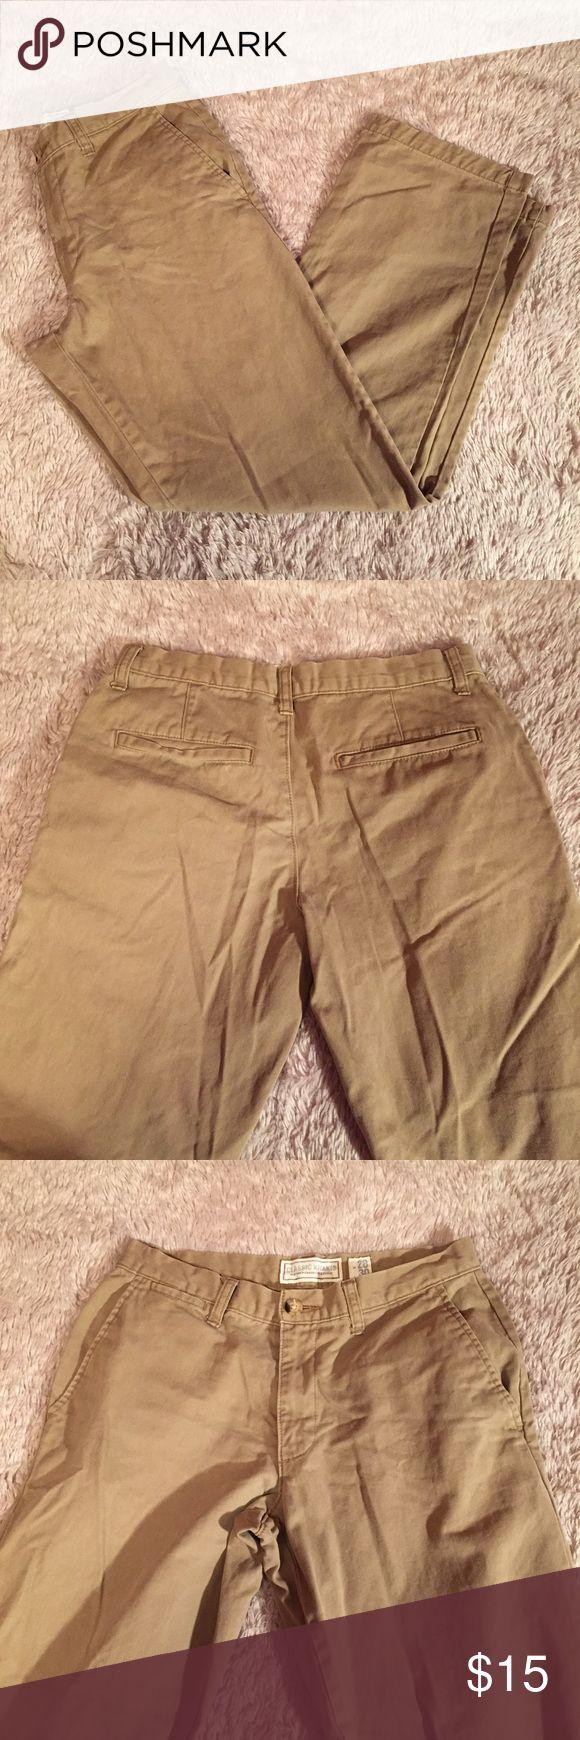 "Men's khaki pants Mens khaki pants from Old Navy. ""classic khaki"" style, size 28x30. Good used condition Old Navy Pants Chinos & Khakis"